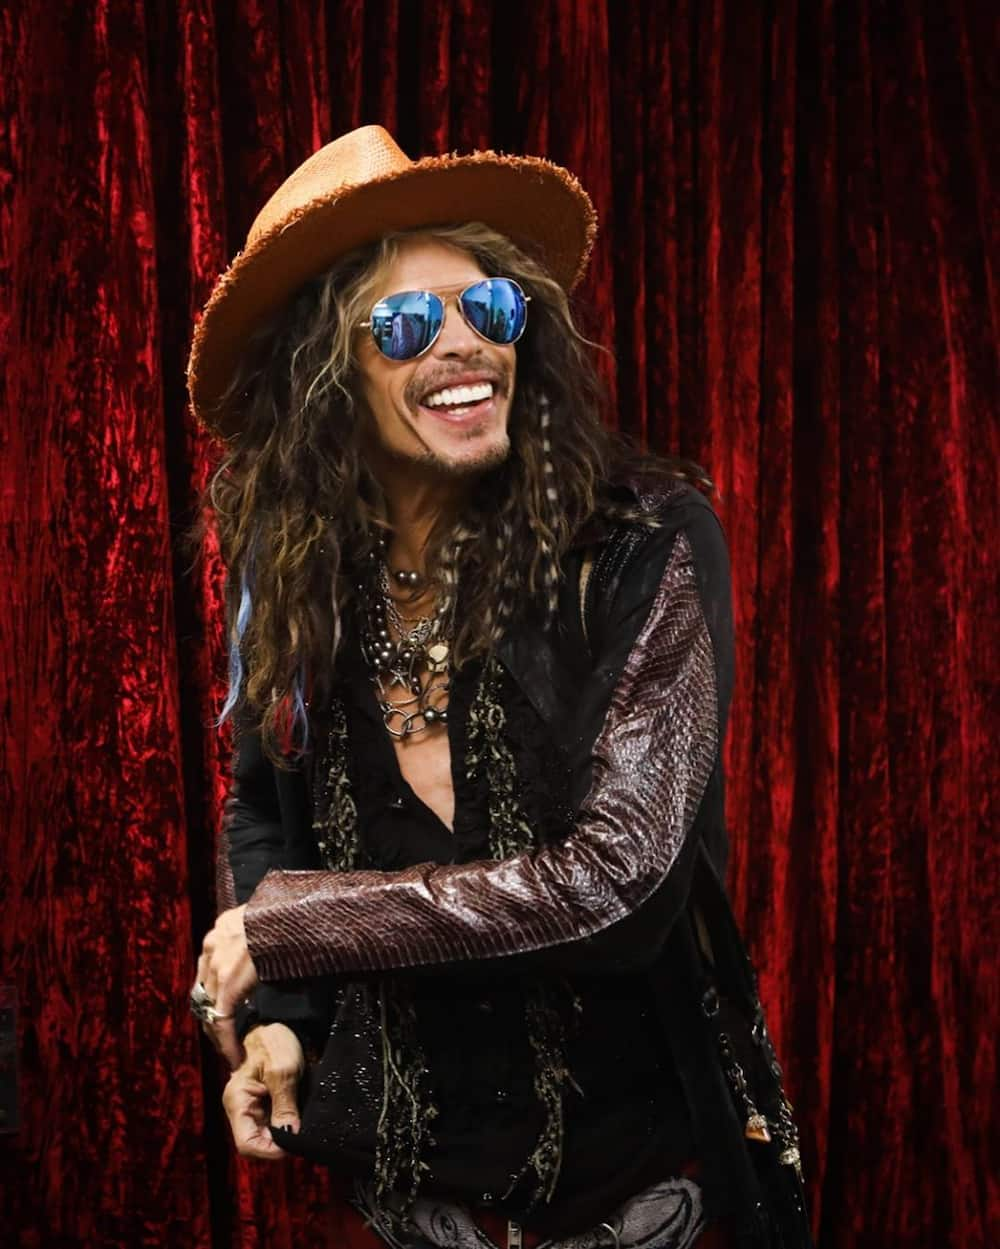 Aerosmith lead singer